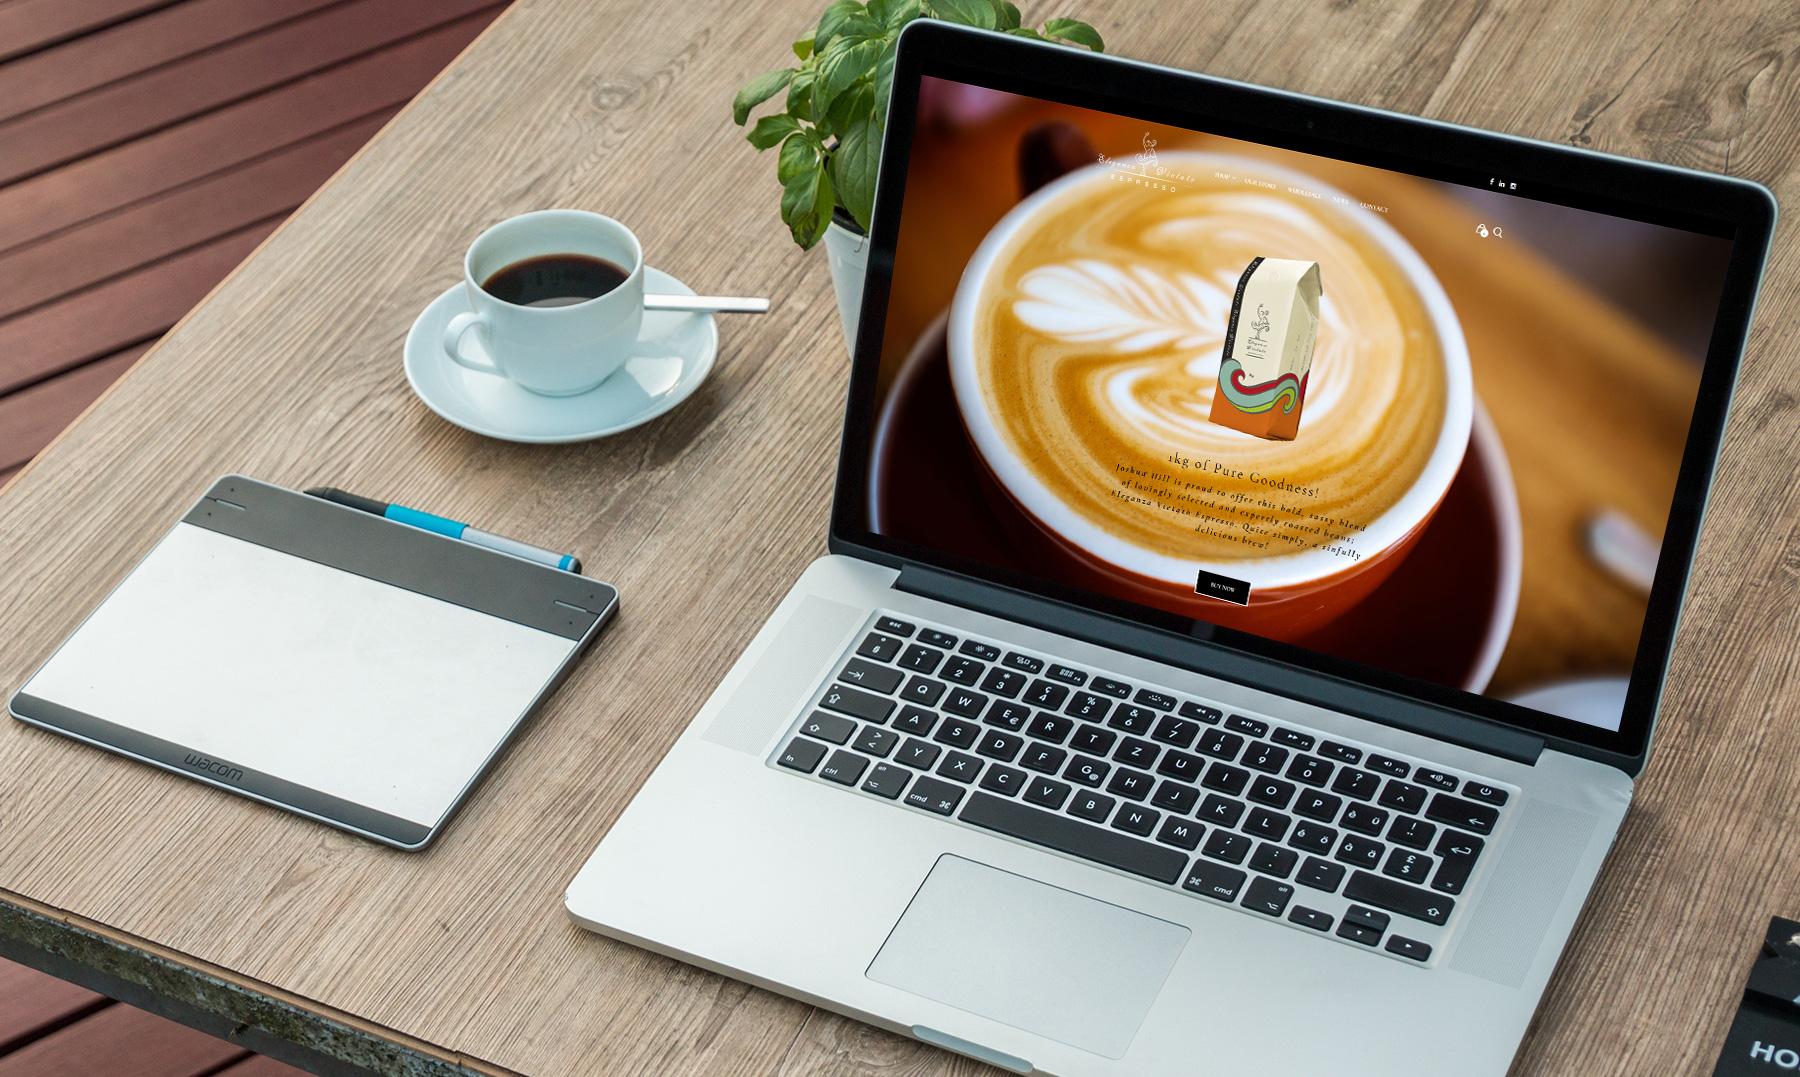 e commerce website coffee beans